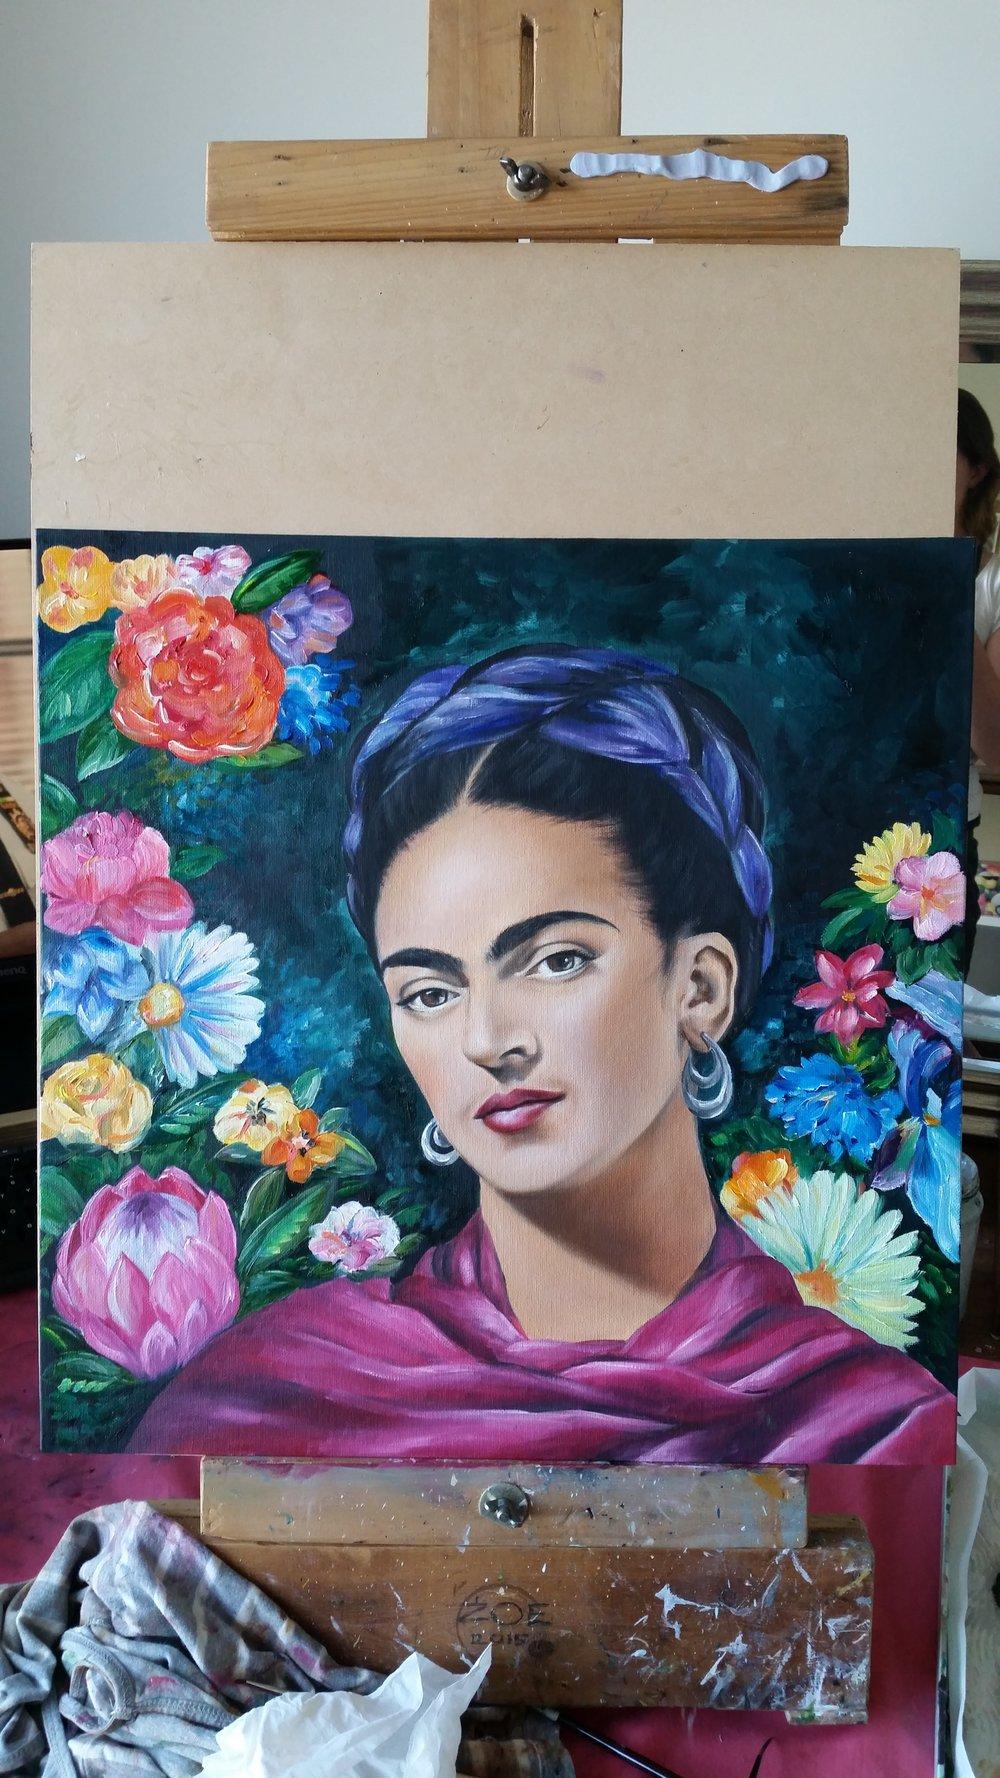 Flowers Frida oil painting - Zoe Wood 2017